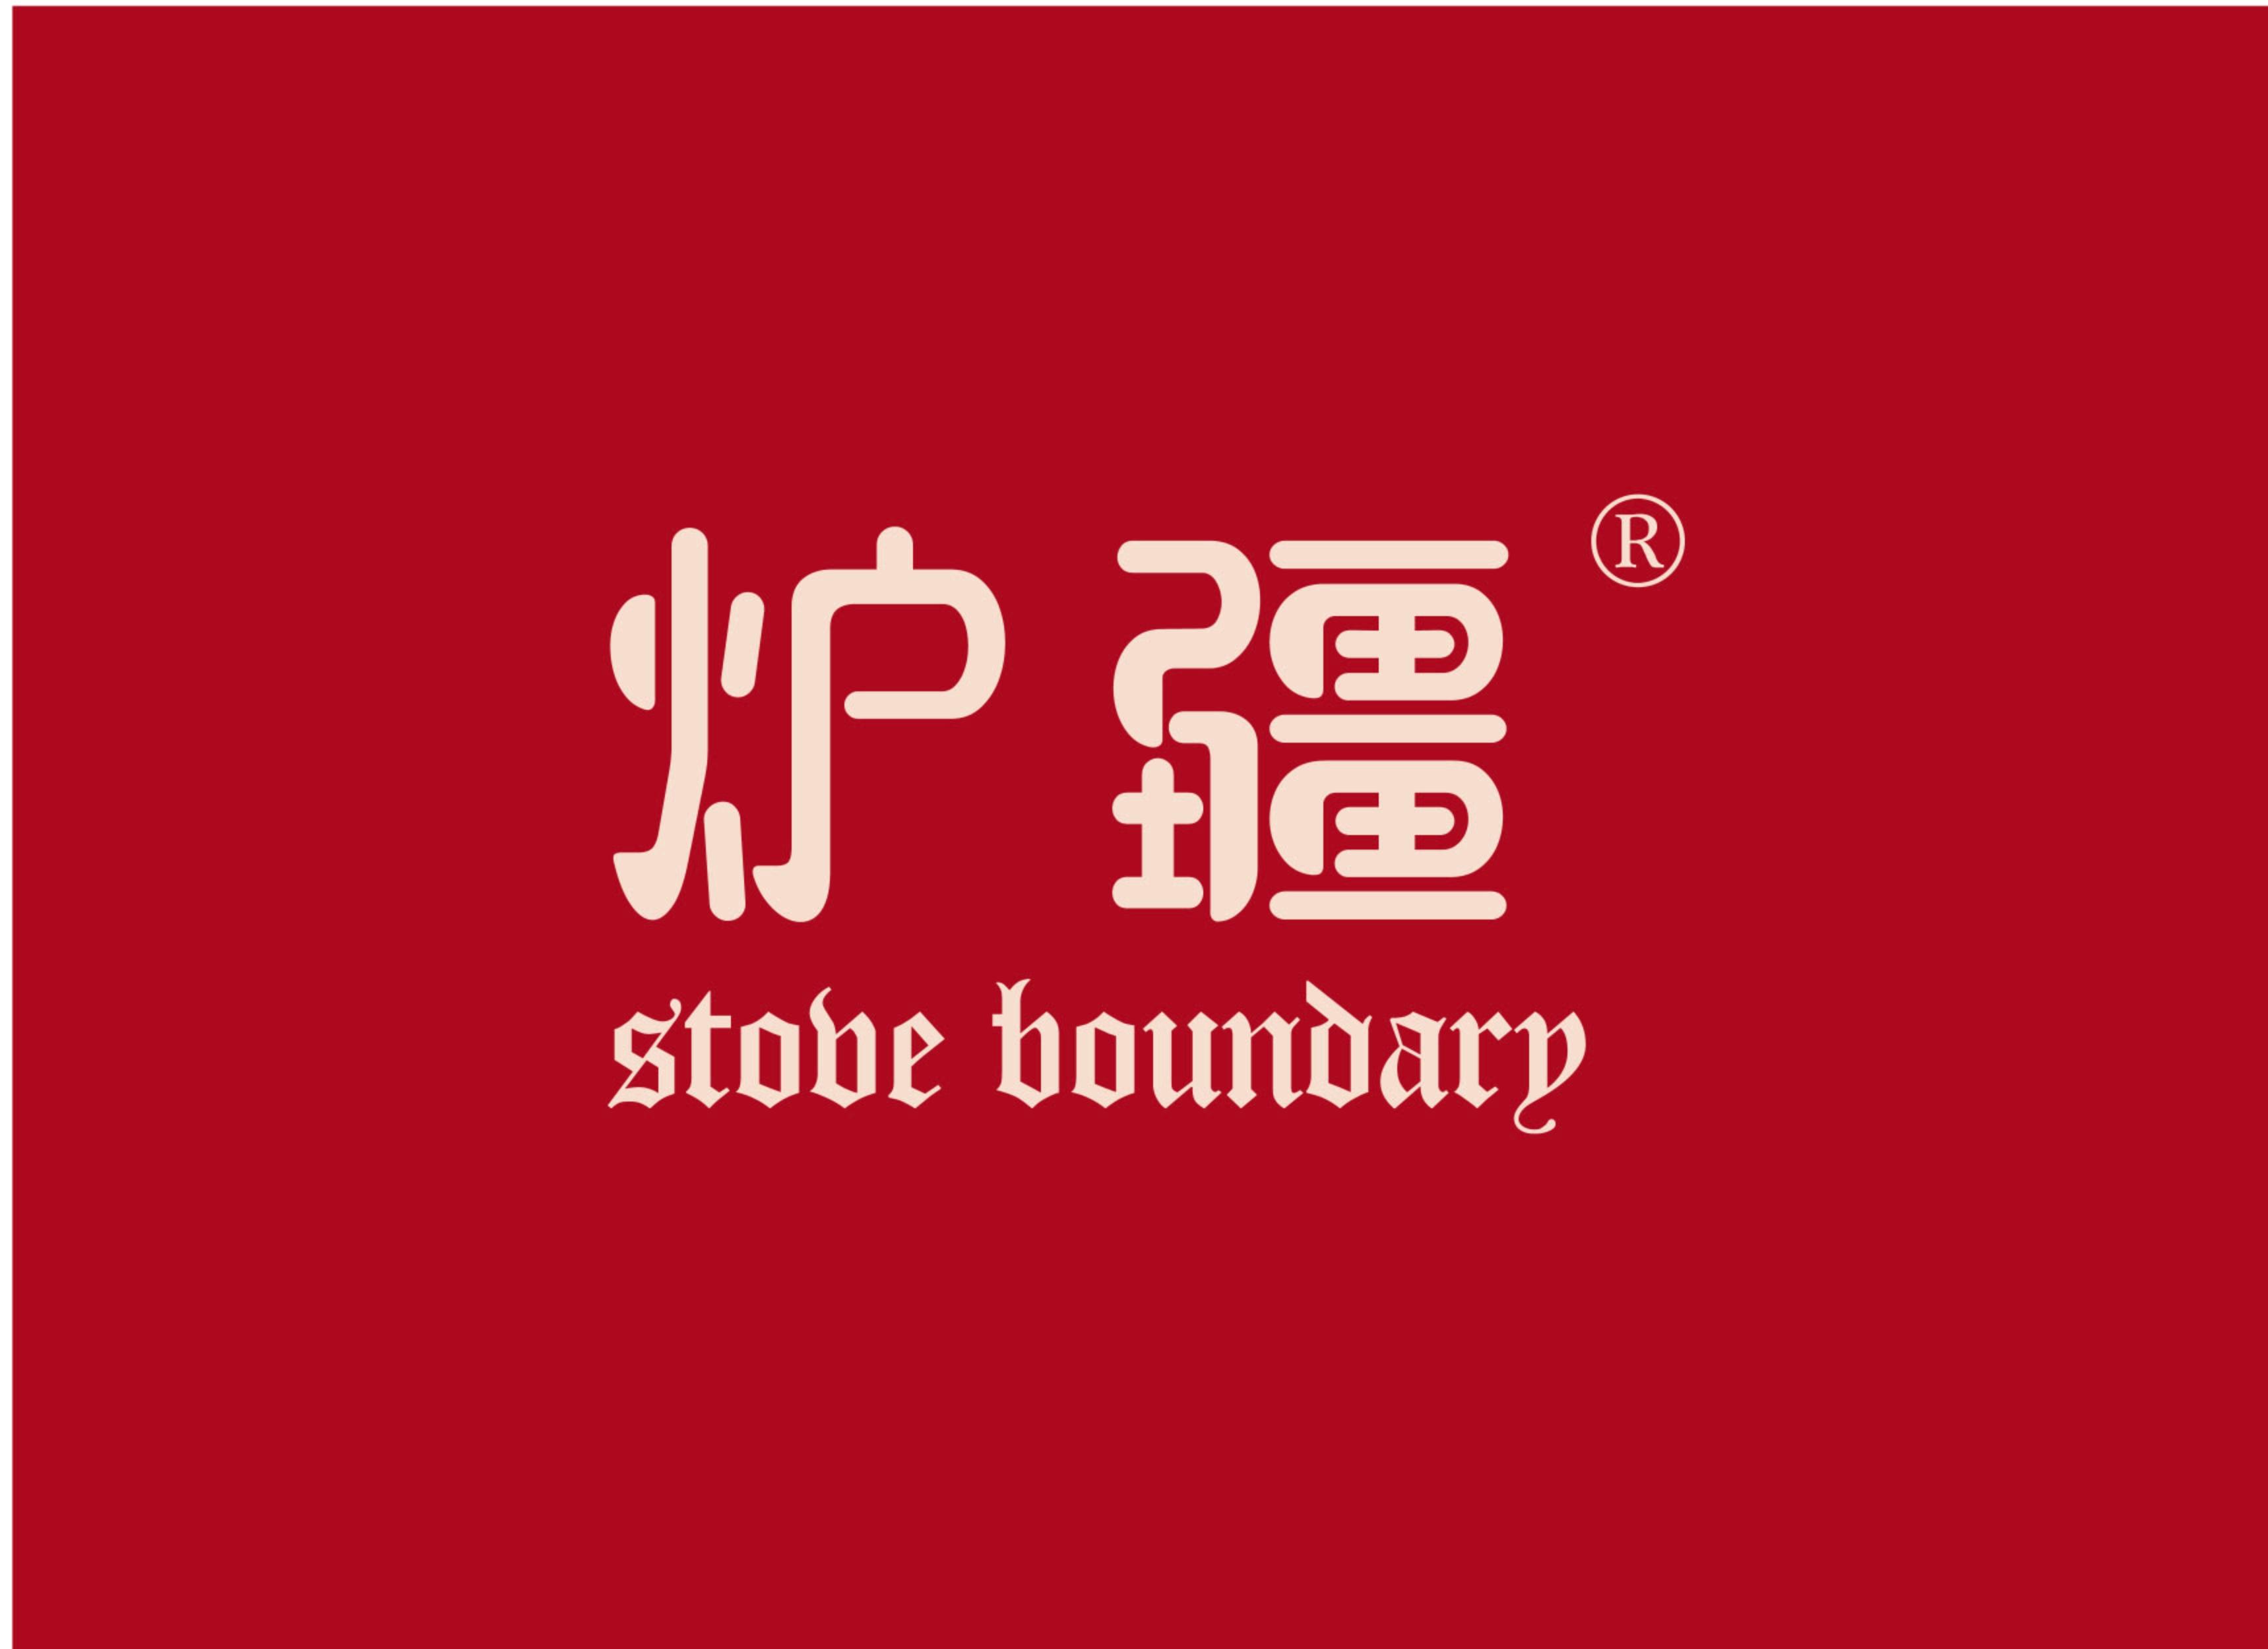 炉疆 STOVE BOUNDARY